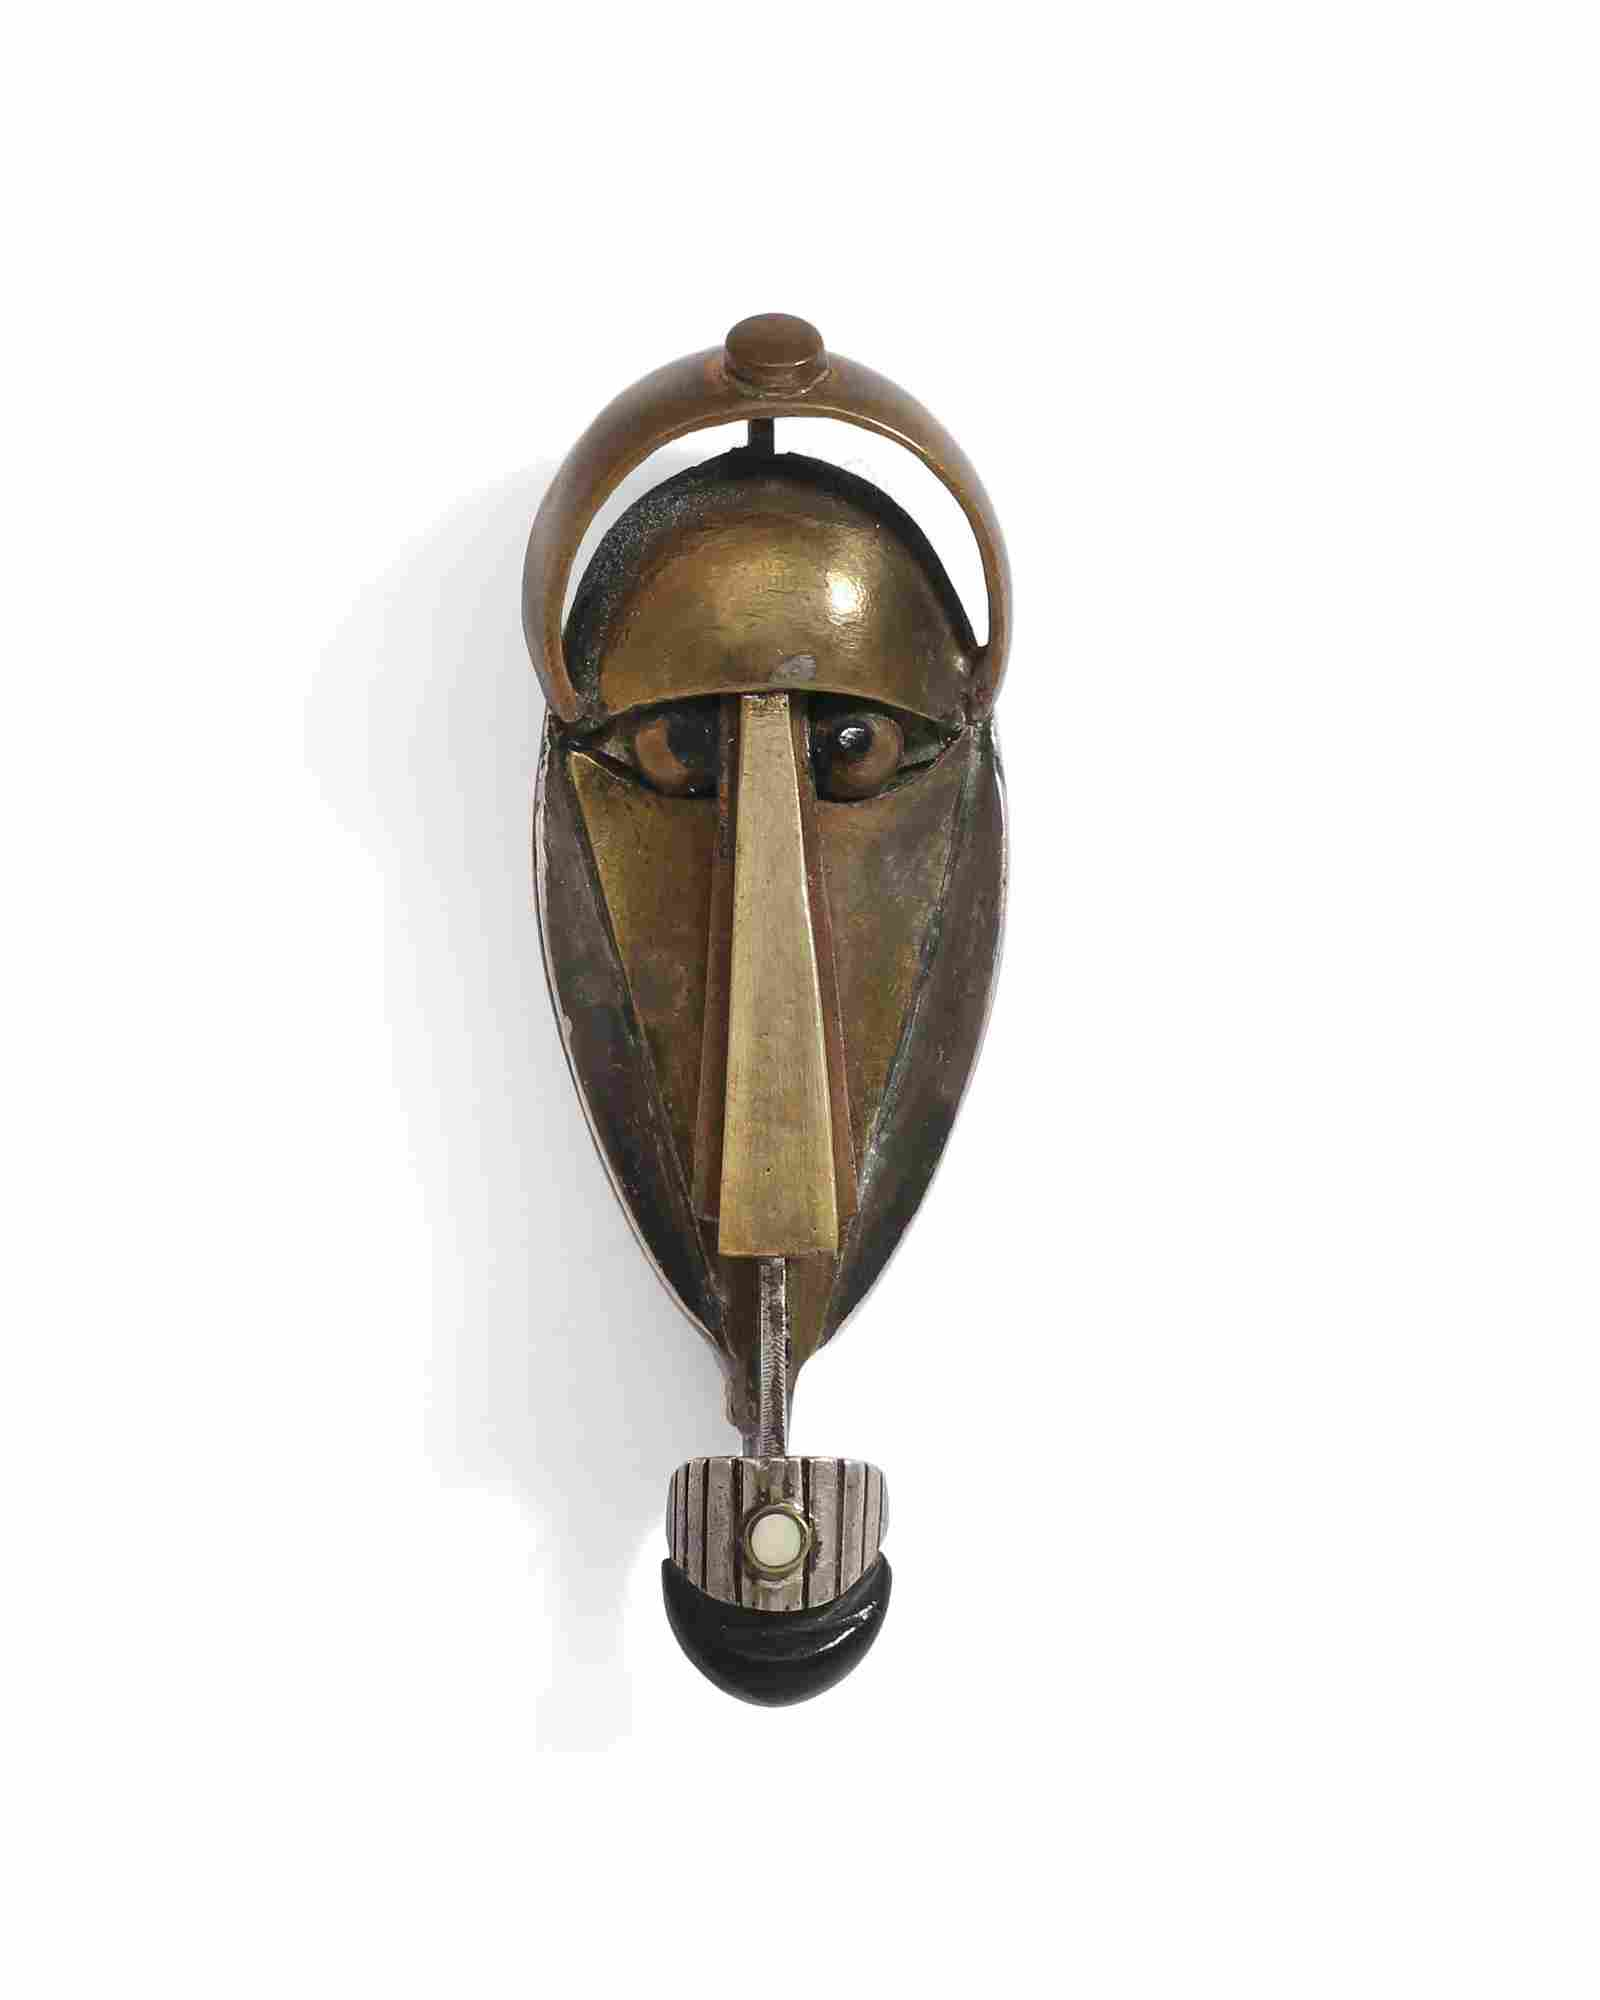 A Peter Macchiarini Modernist mixed-metal brooch